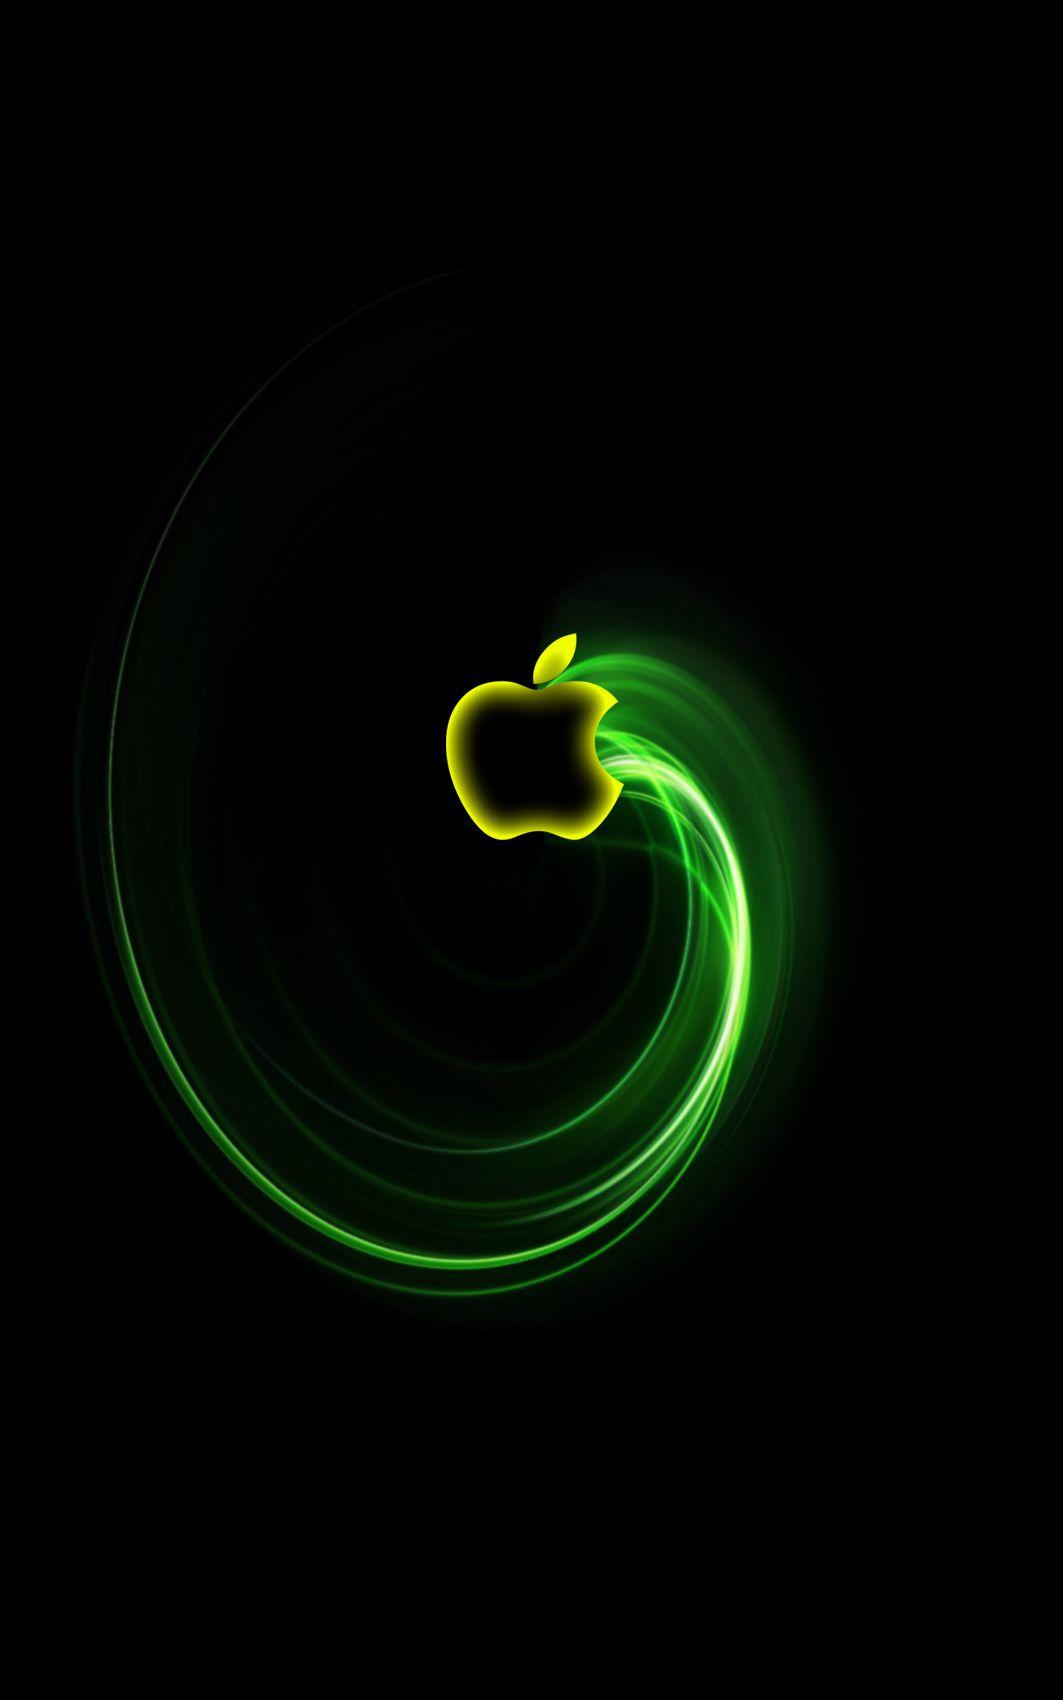 top apple wallpaper Tag Download HD Wallpaper Page hd